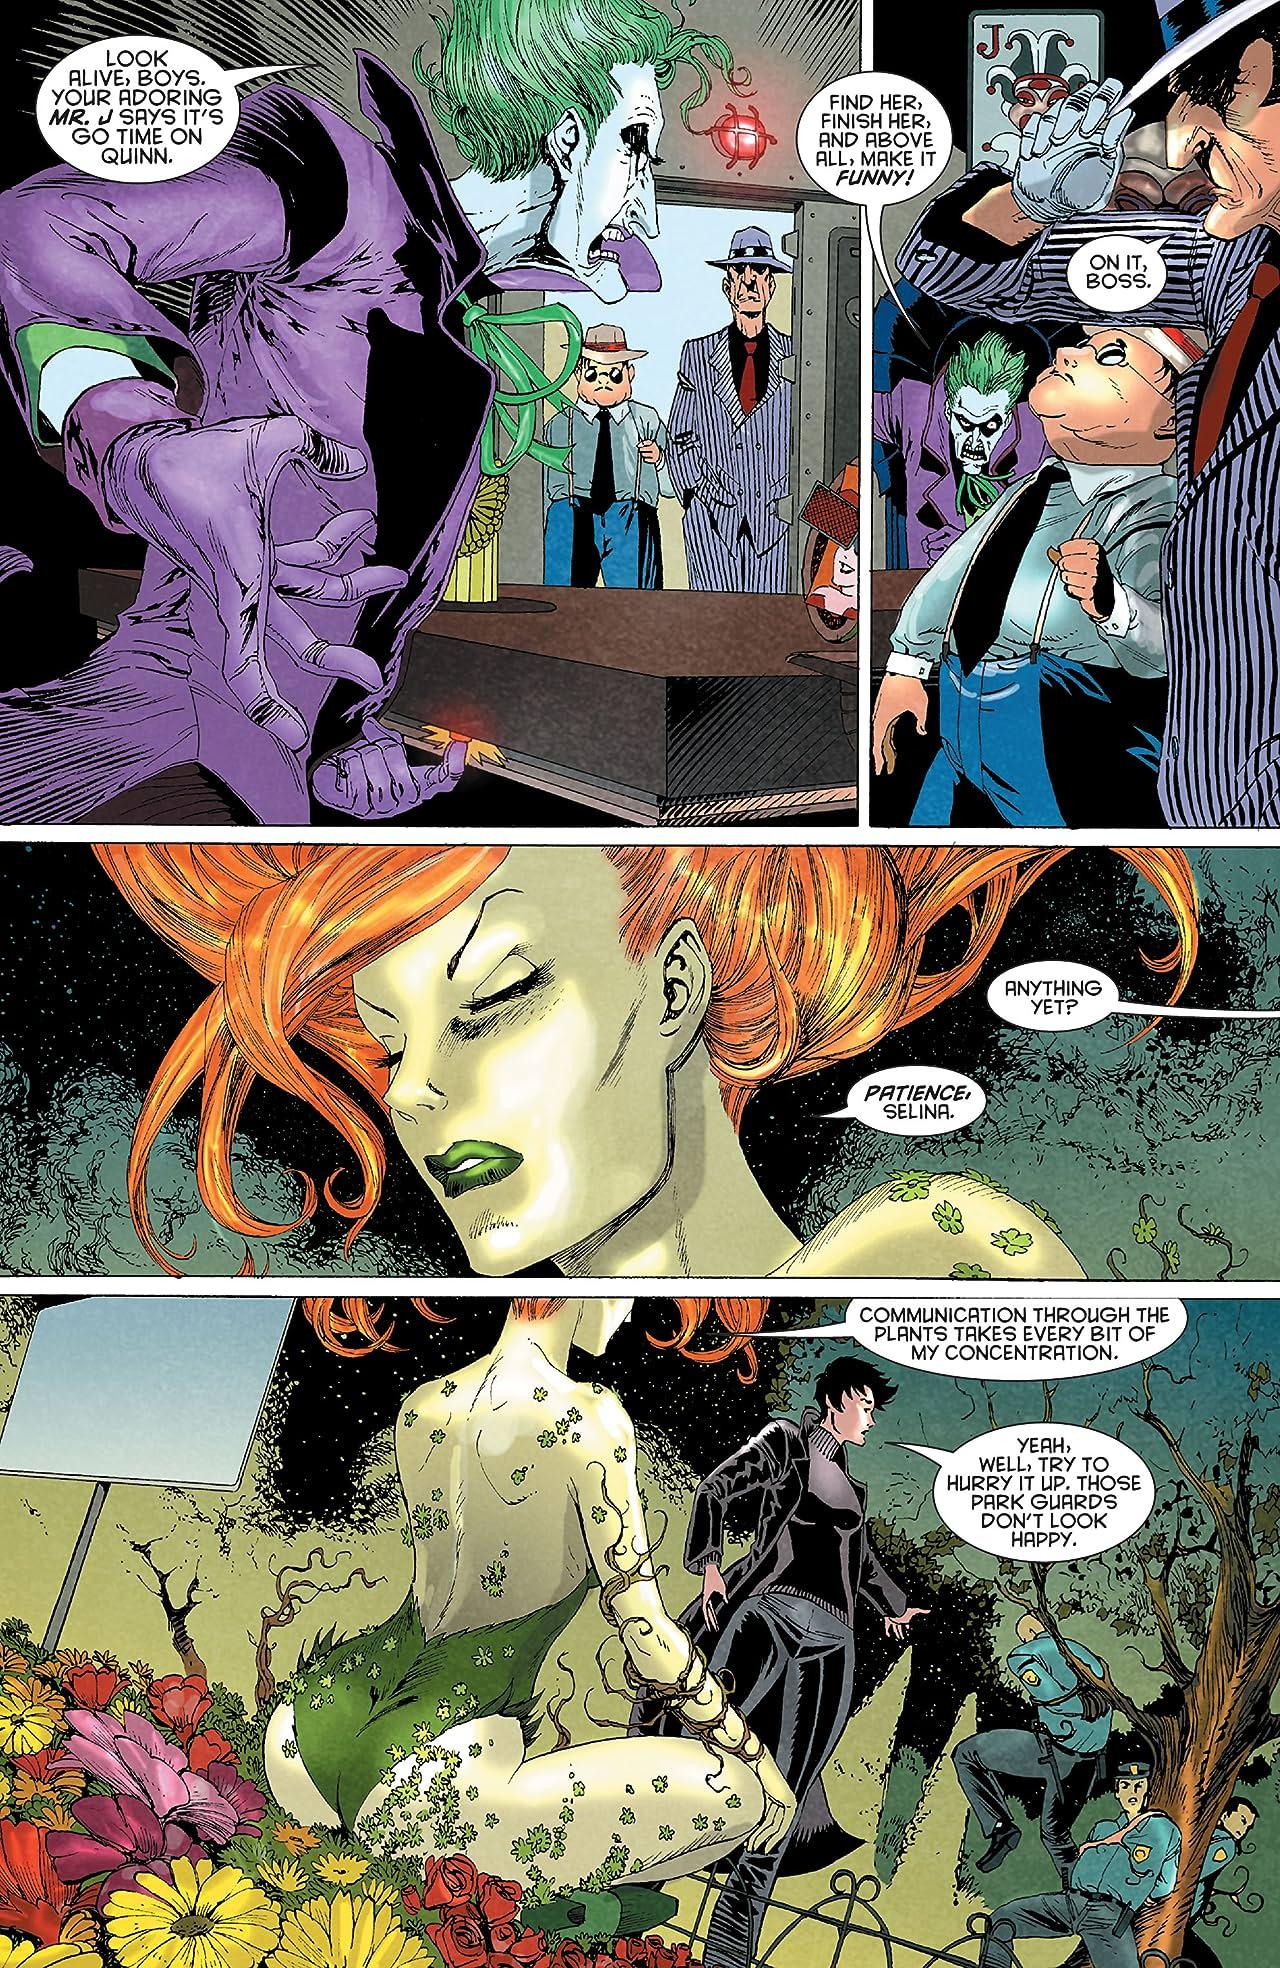 Gotham City Sirens #4